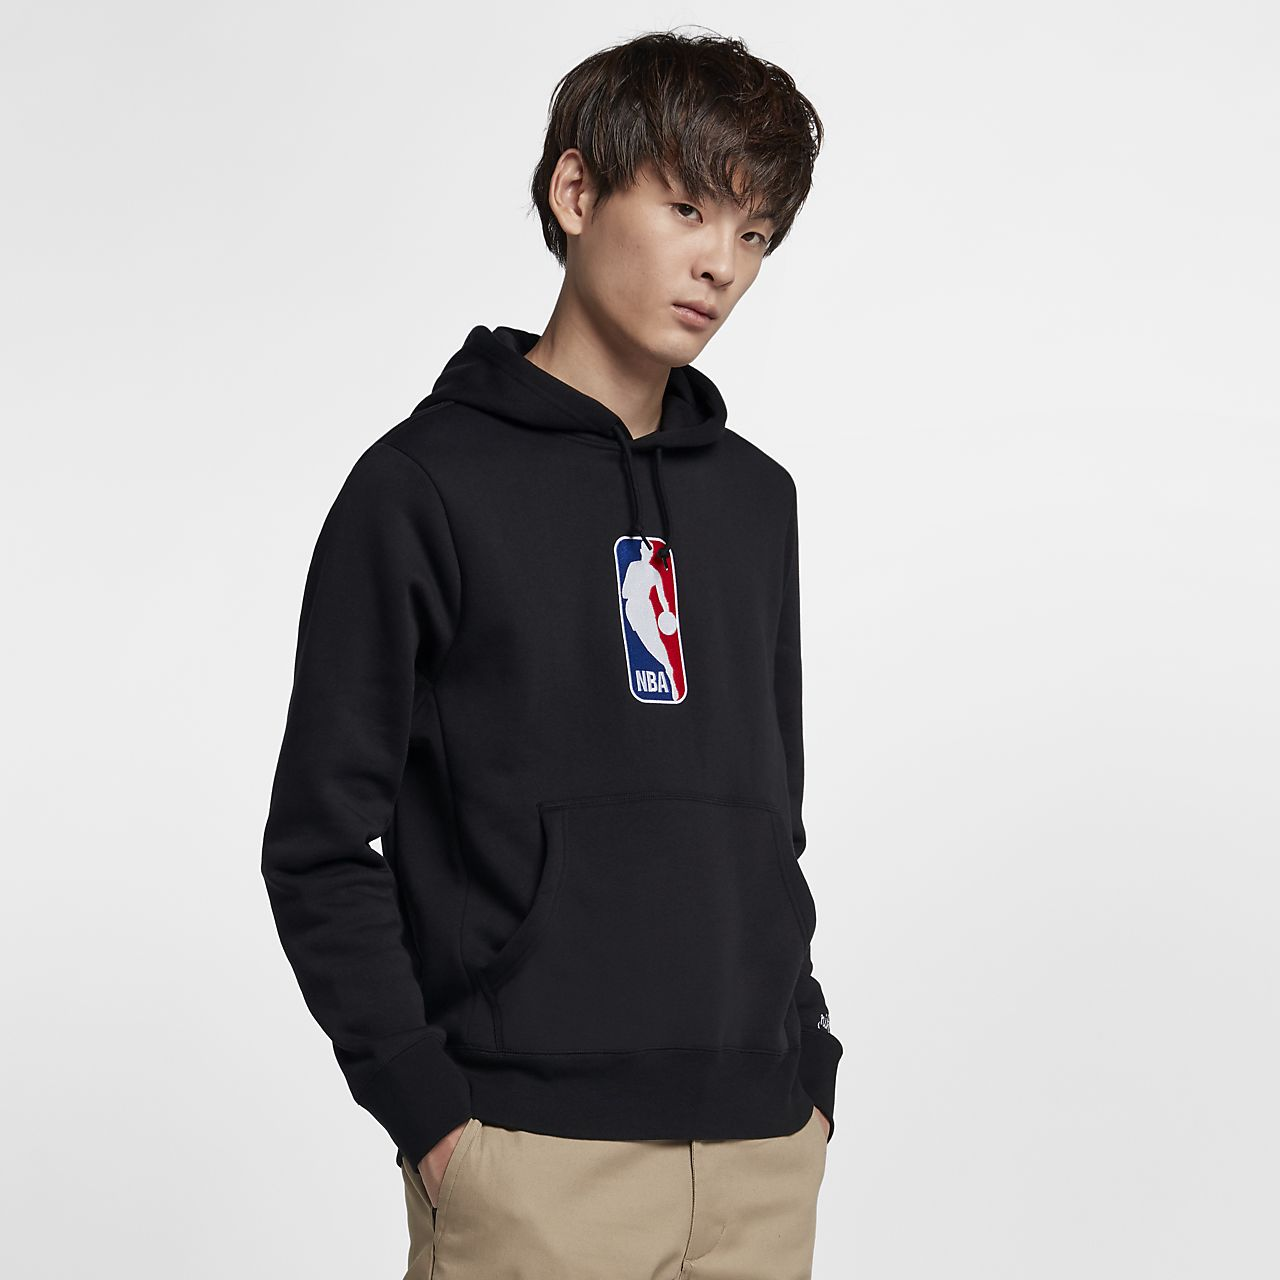 Nike SB x NBA Icon Men's Skate Hoodie